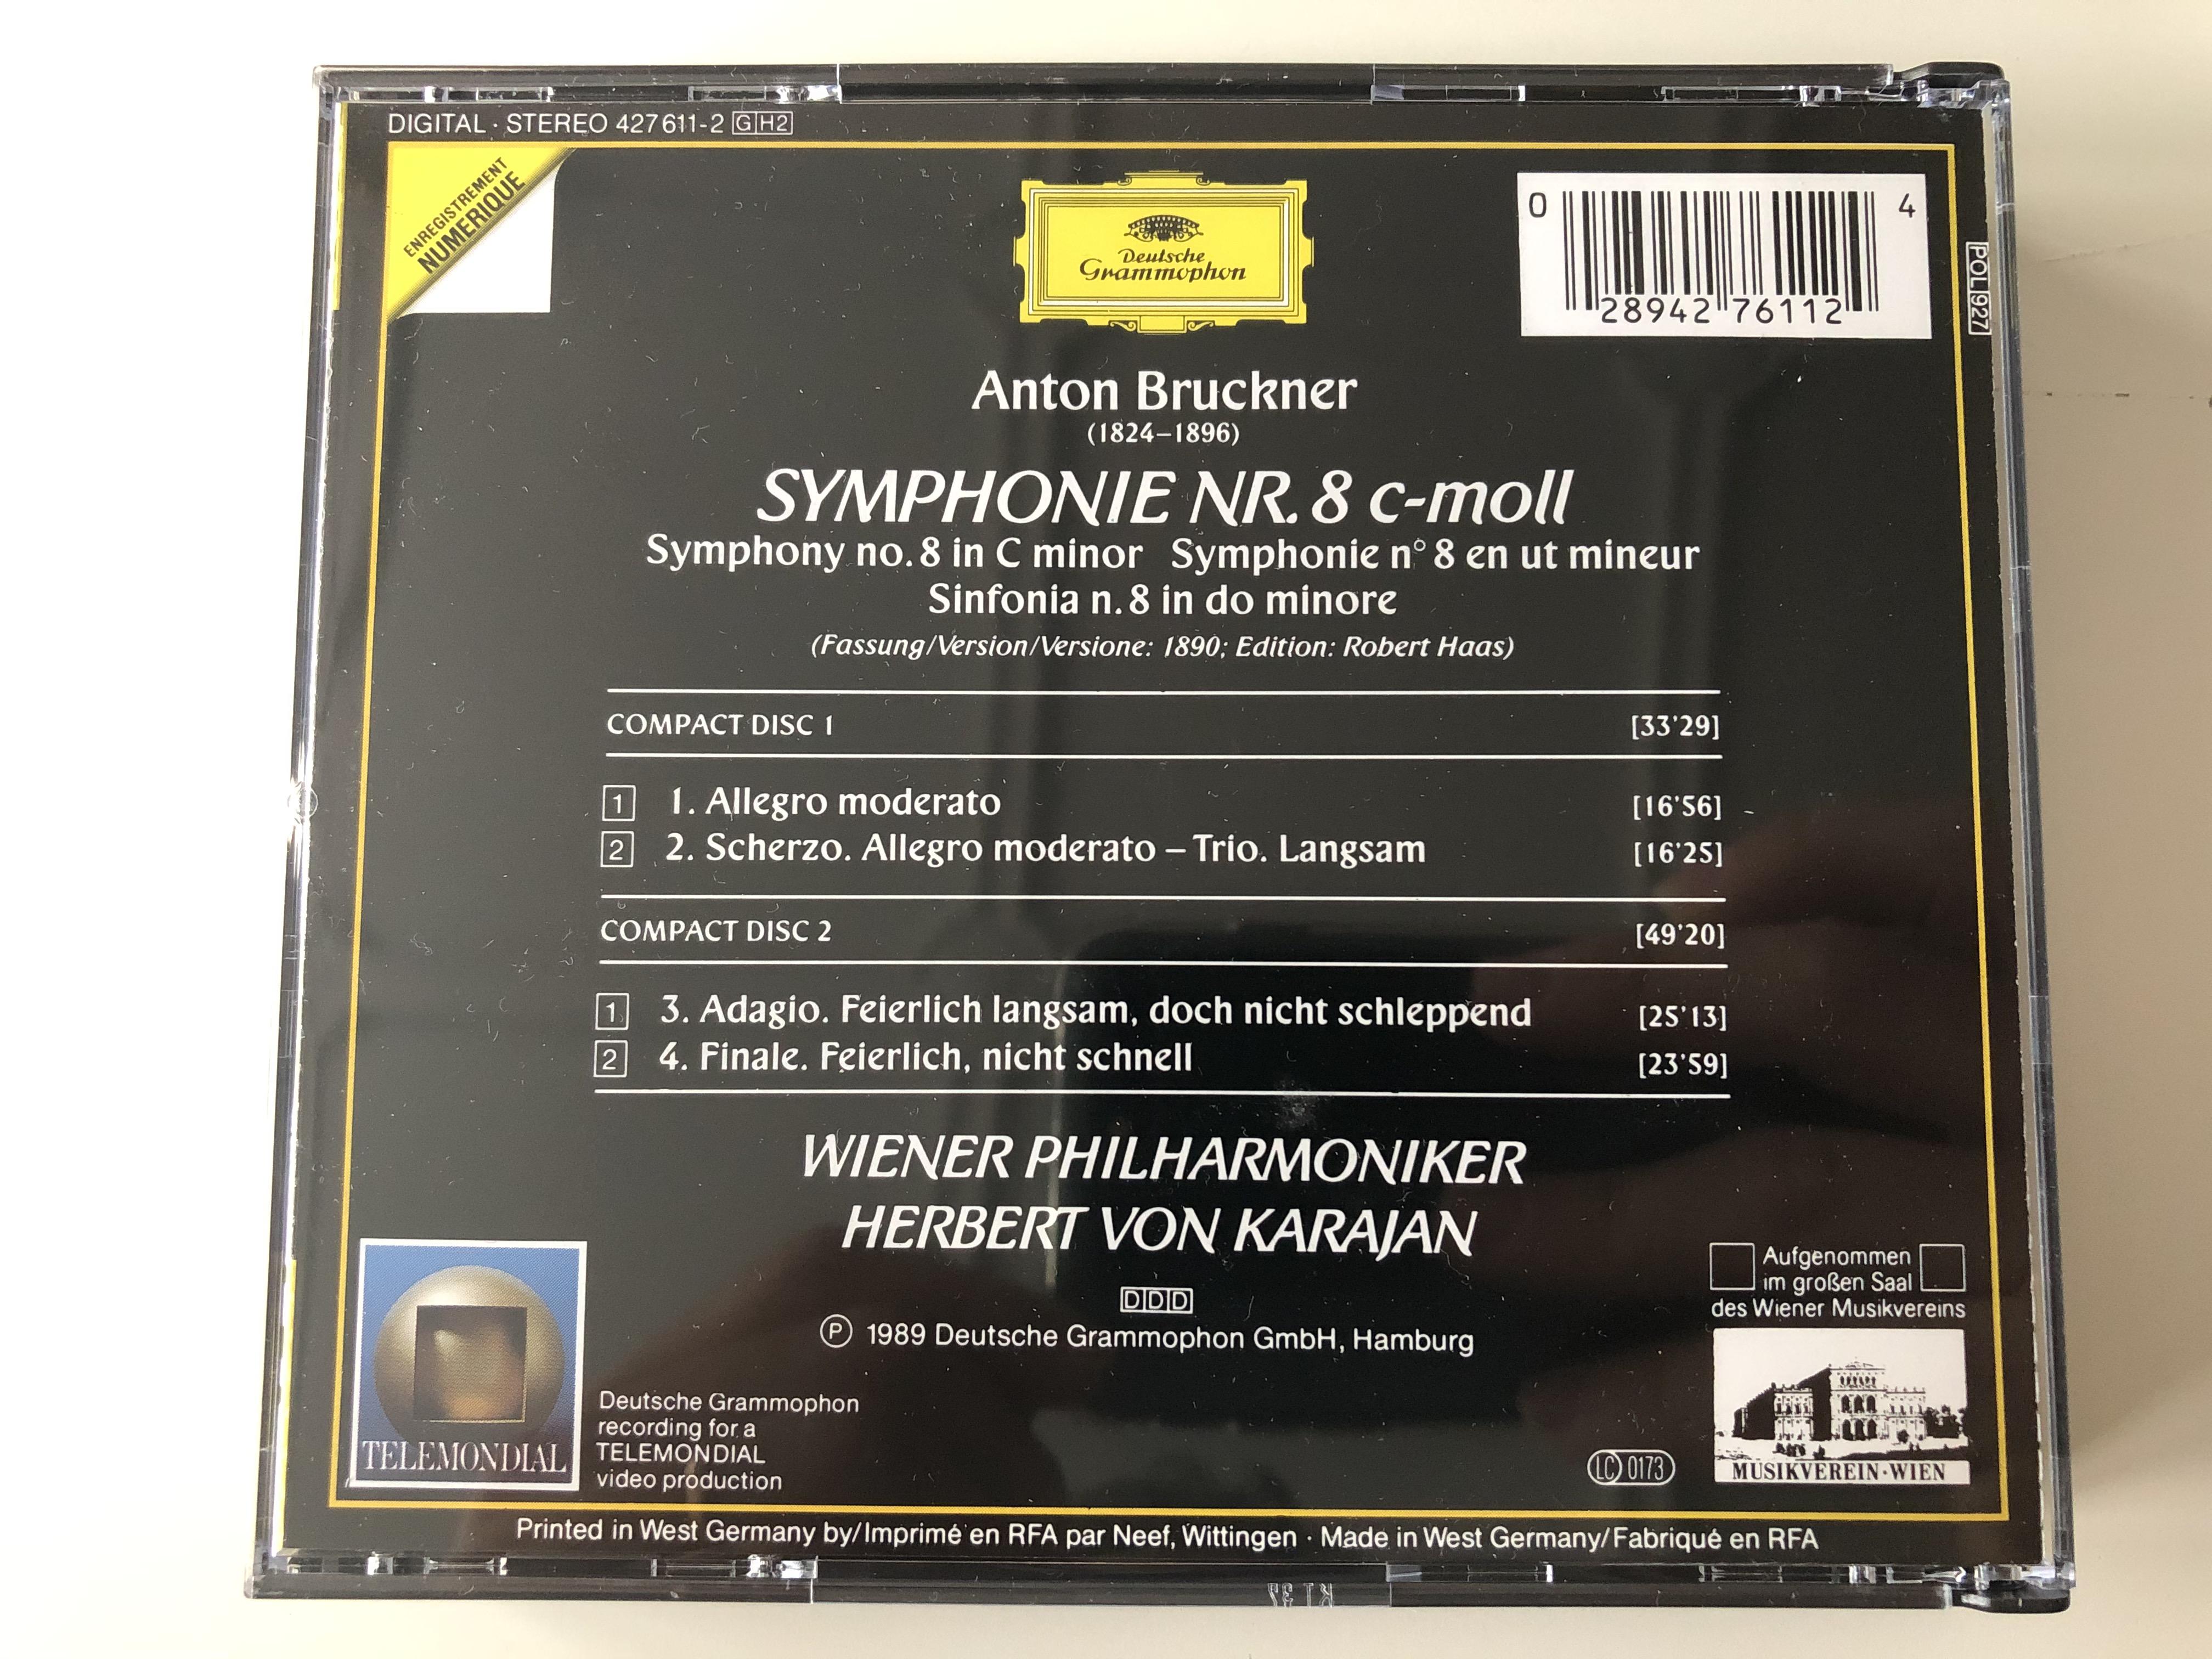 anton-bruckner-symphonie-no.-8-wiener-philharmoniker-herbert-von-karajan-deutsche-grammophon-2x-audio-cd-1989-stereo-427-611-2-10-.jpg